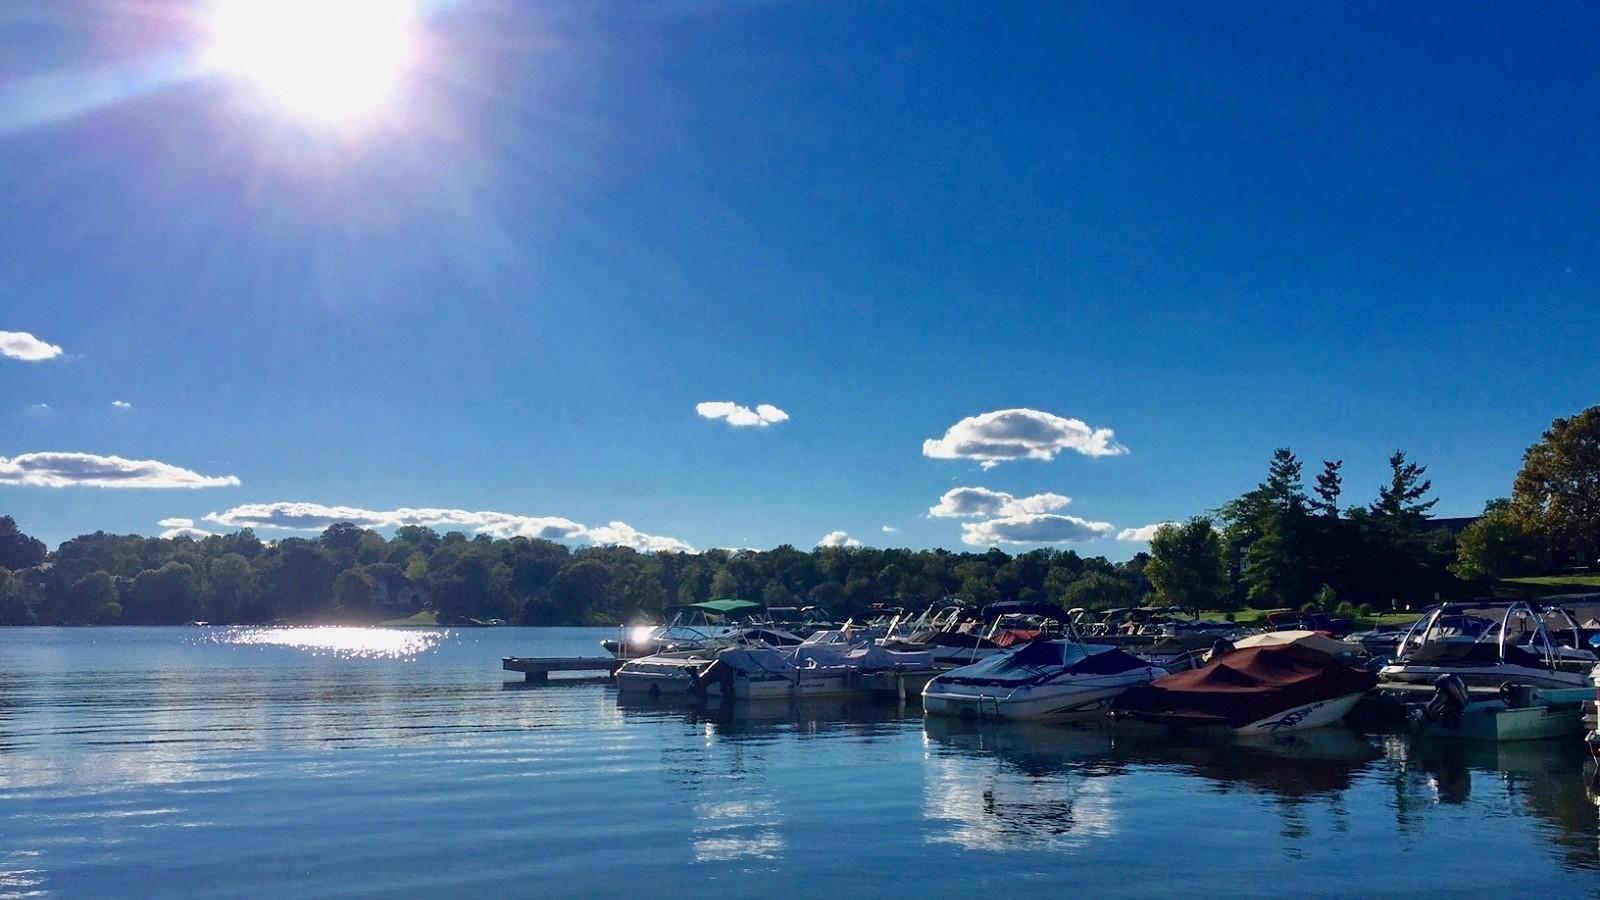 September sun over Hidden Valley Lake marina